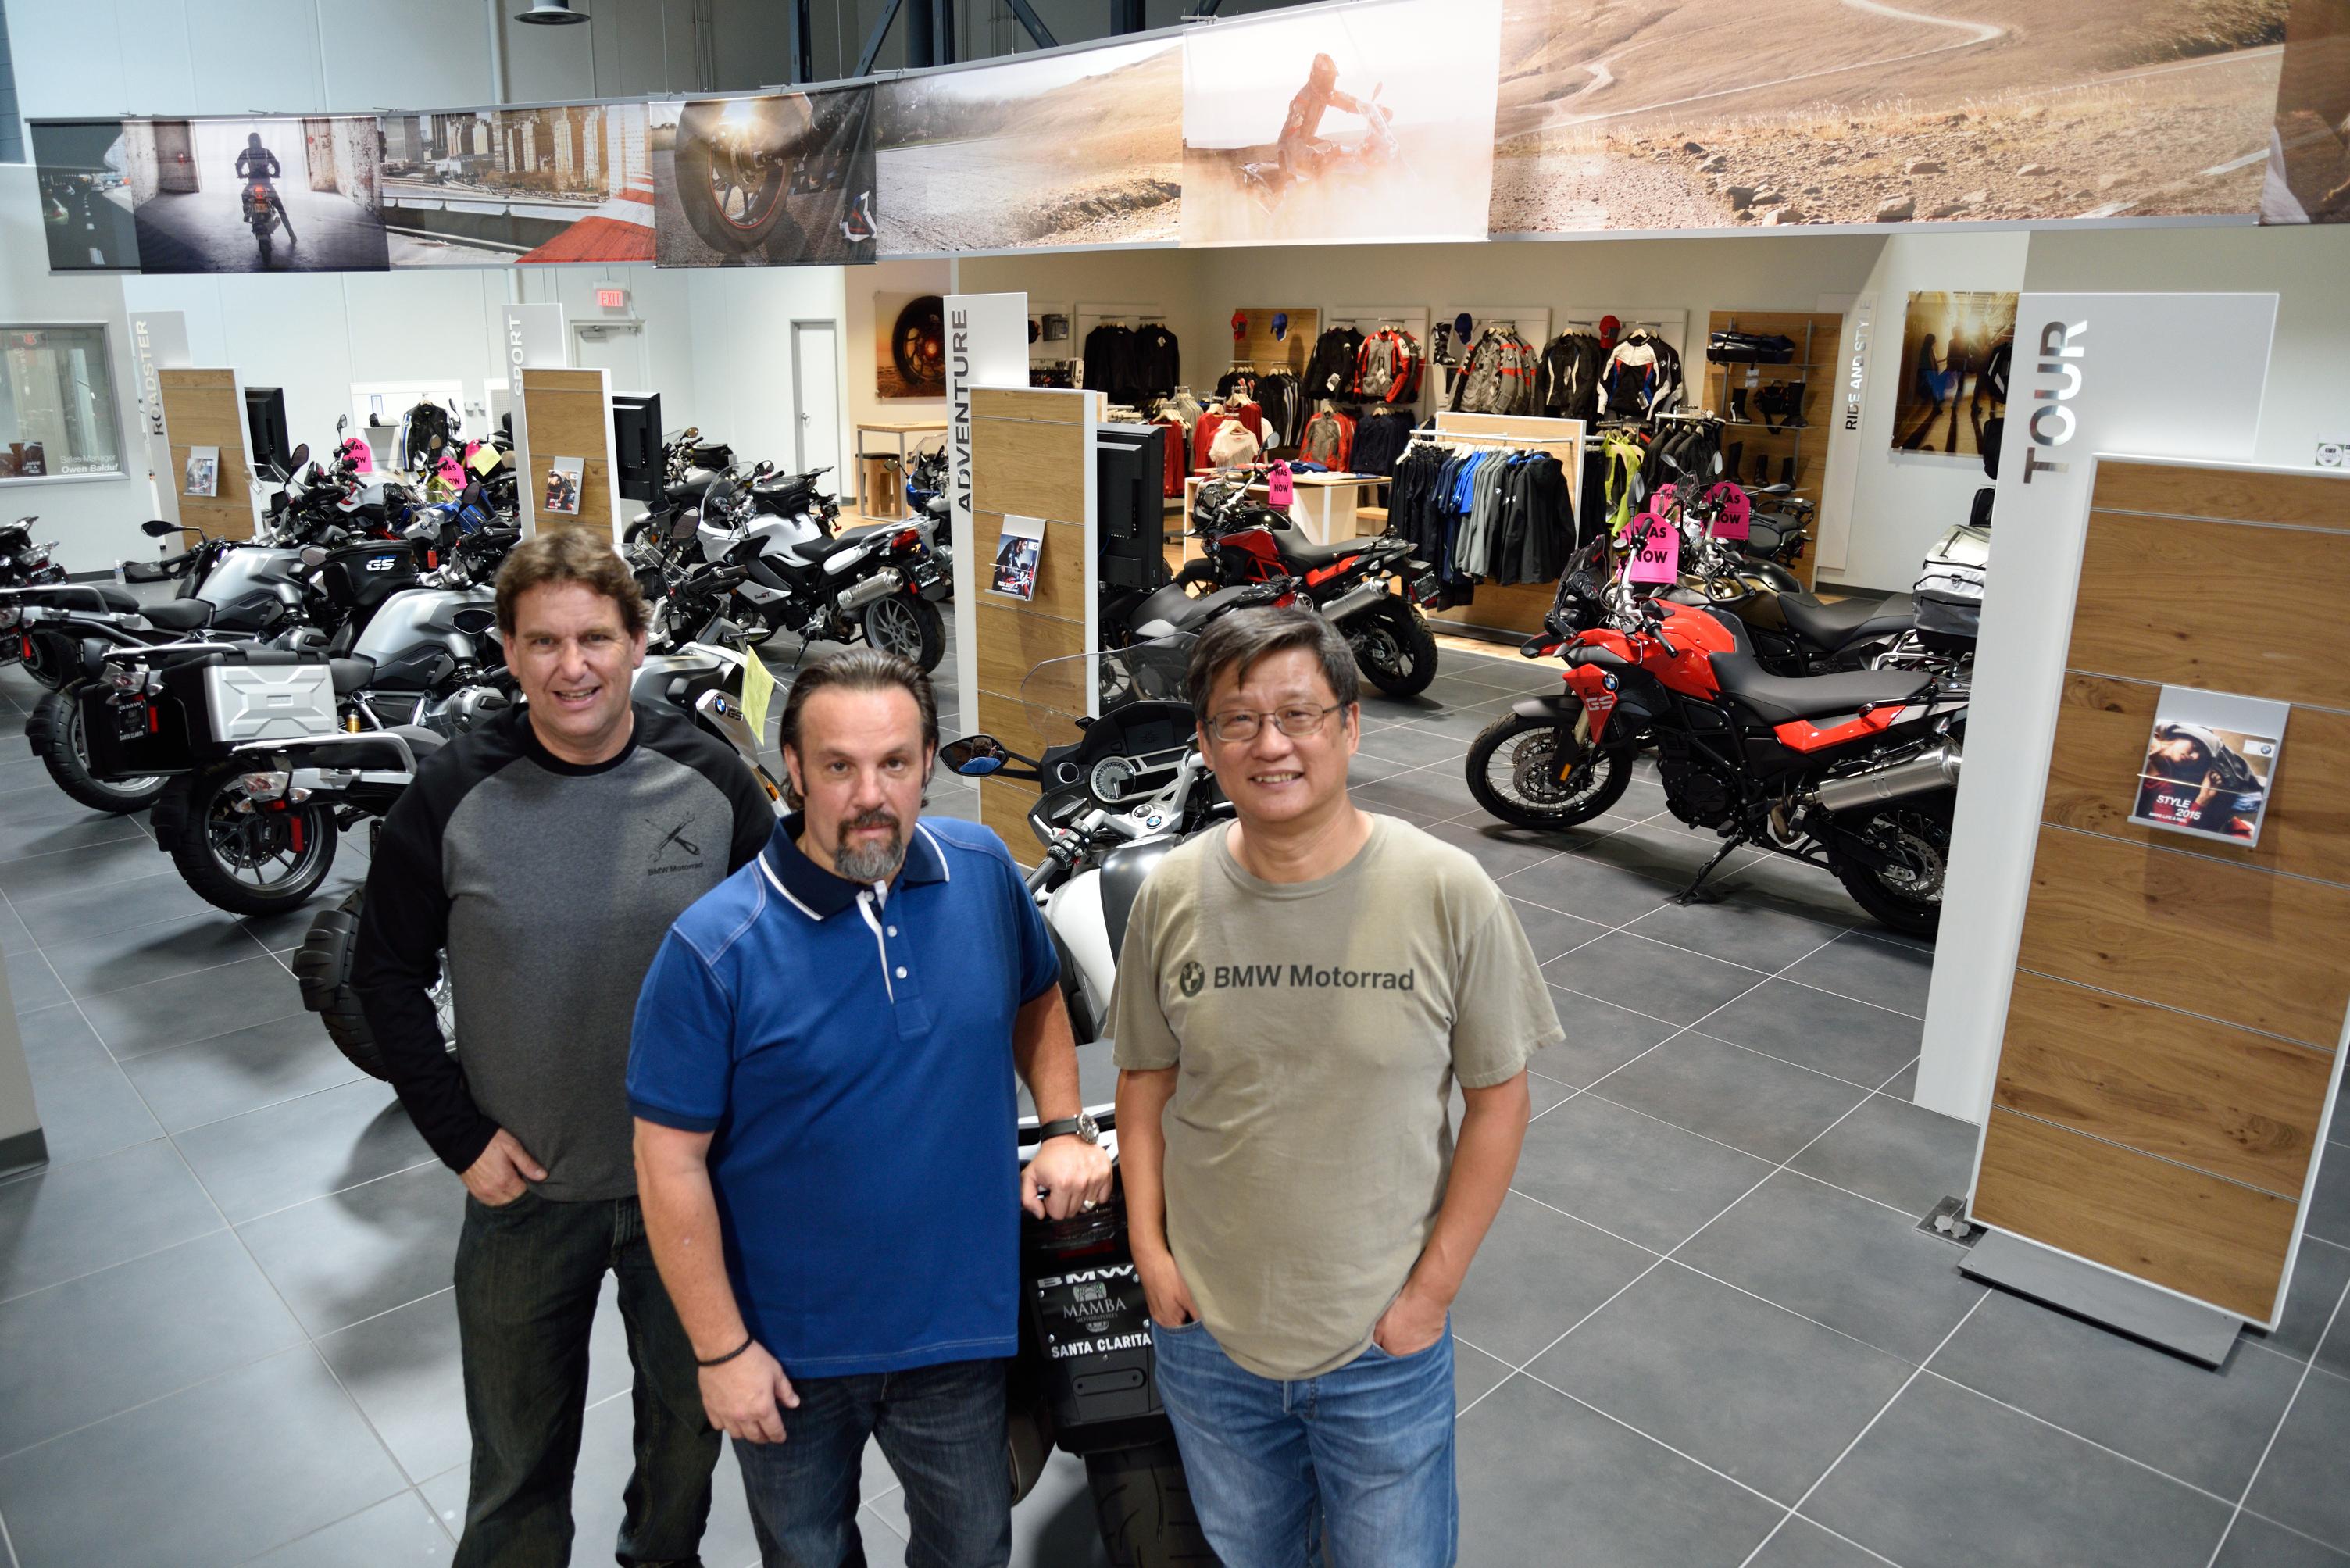 bmw motorrad welcomes bmw motorcycles of santa clarita (ca) - bmw